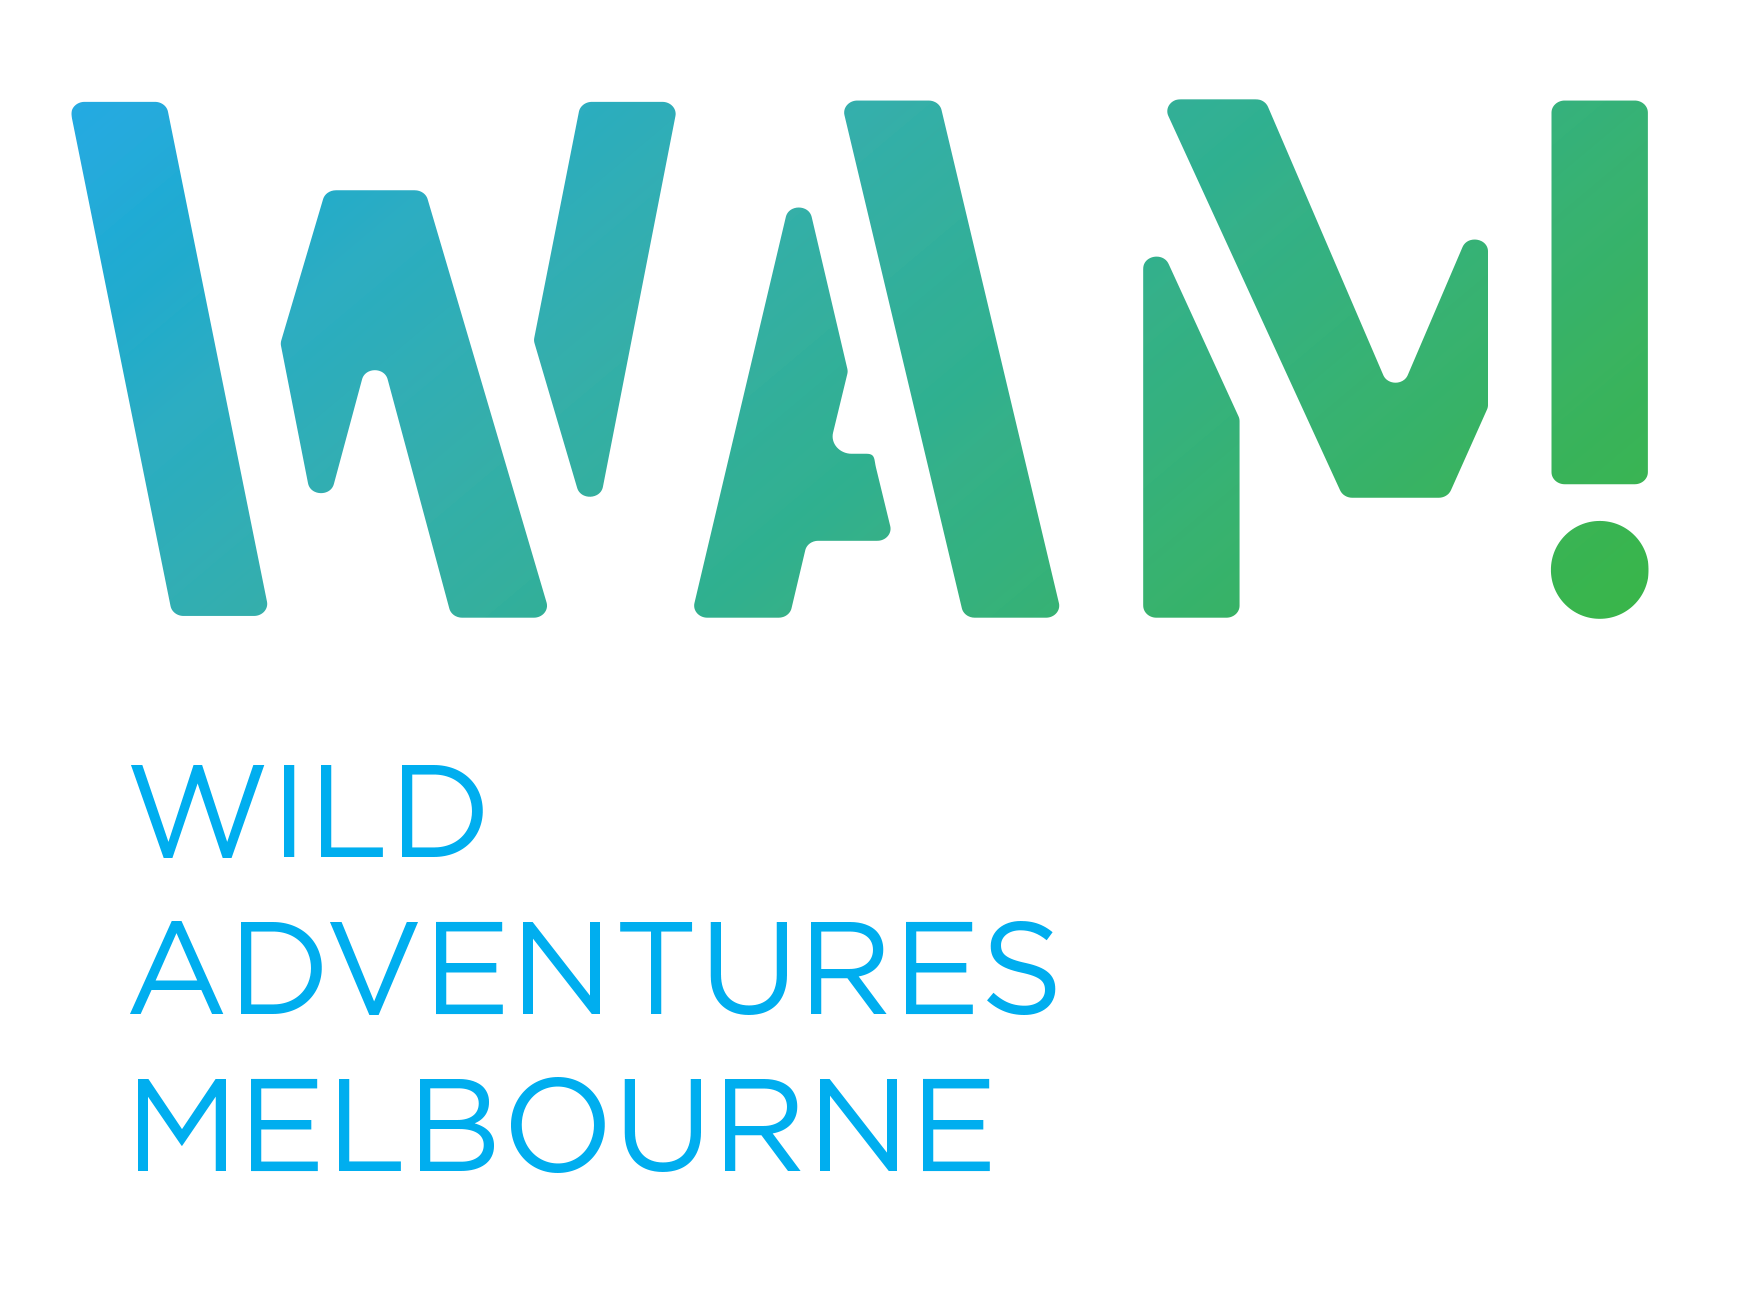 Wild Adventures Melbourne